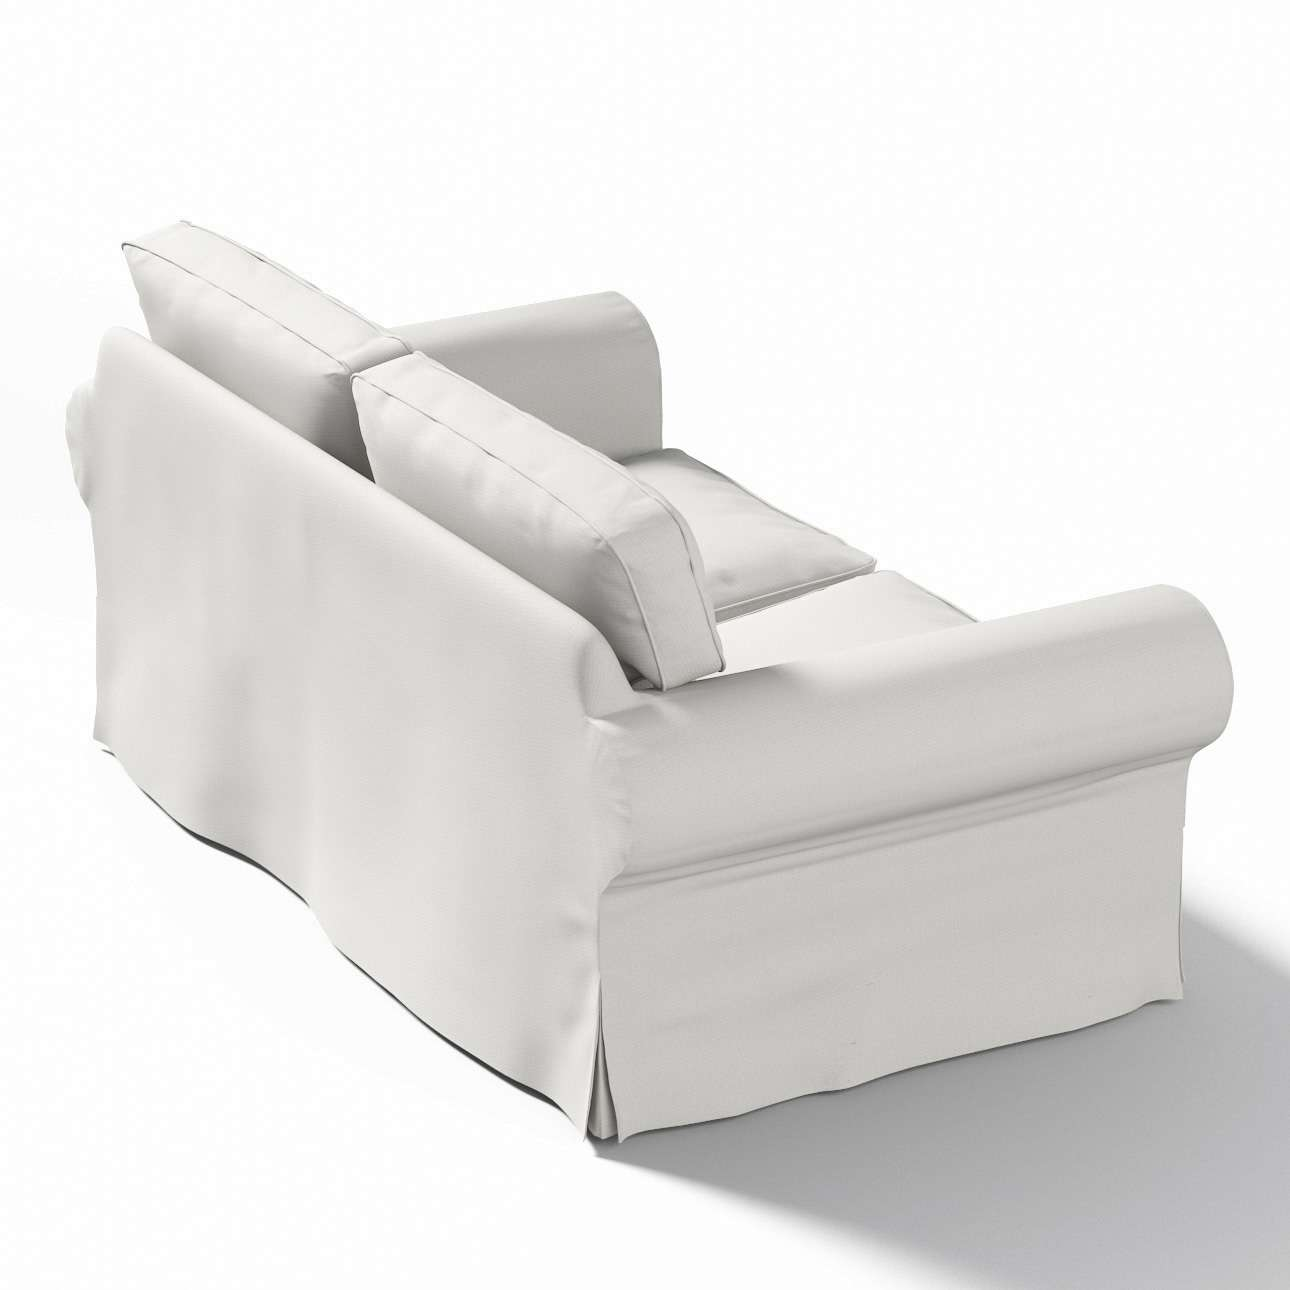 Ektorp 2 sæder sovesofa gammel model<br/>Bredde ca 195cm fra kollektionen Etna, Stof: 705-90